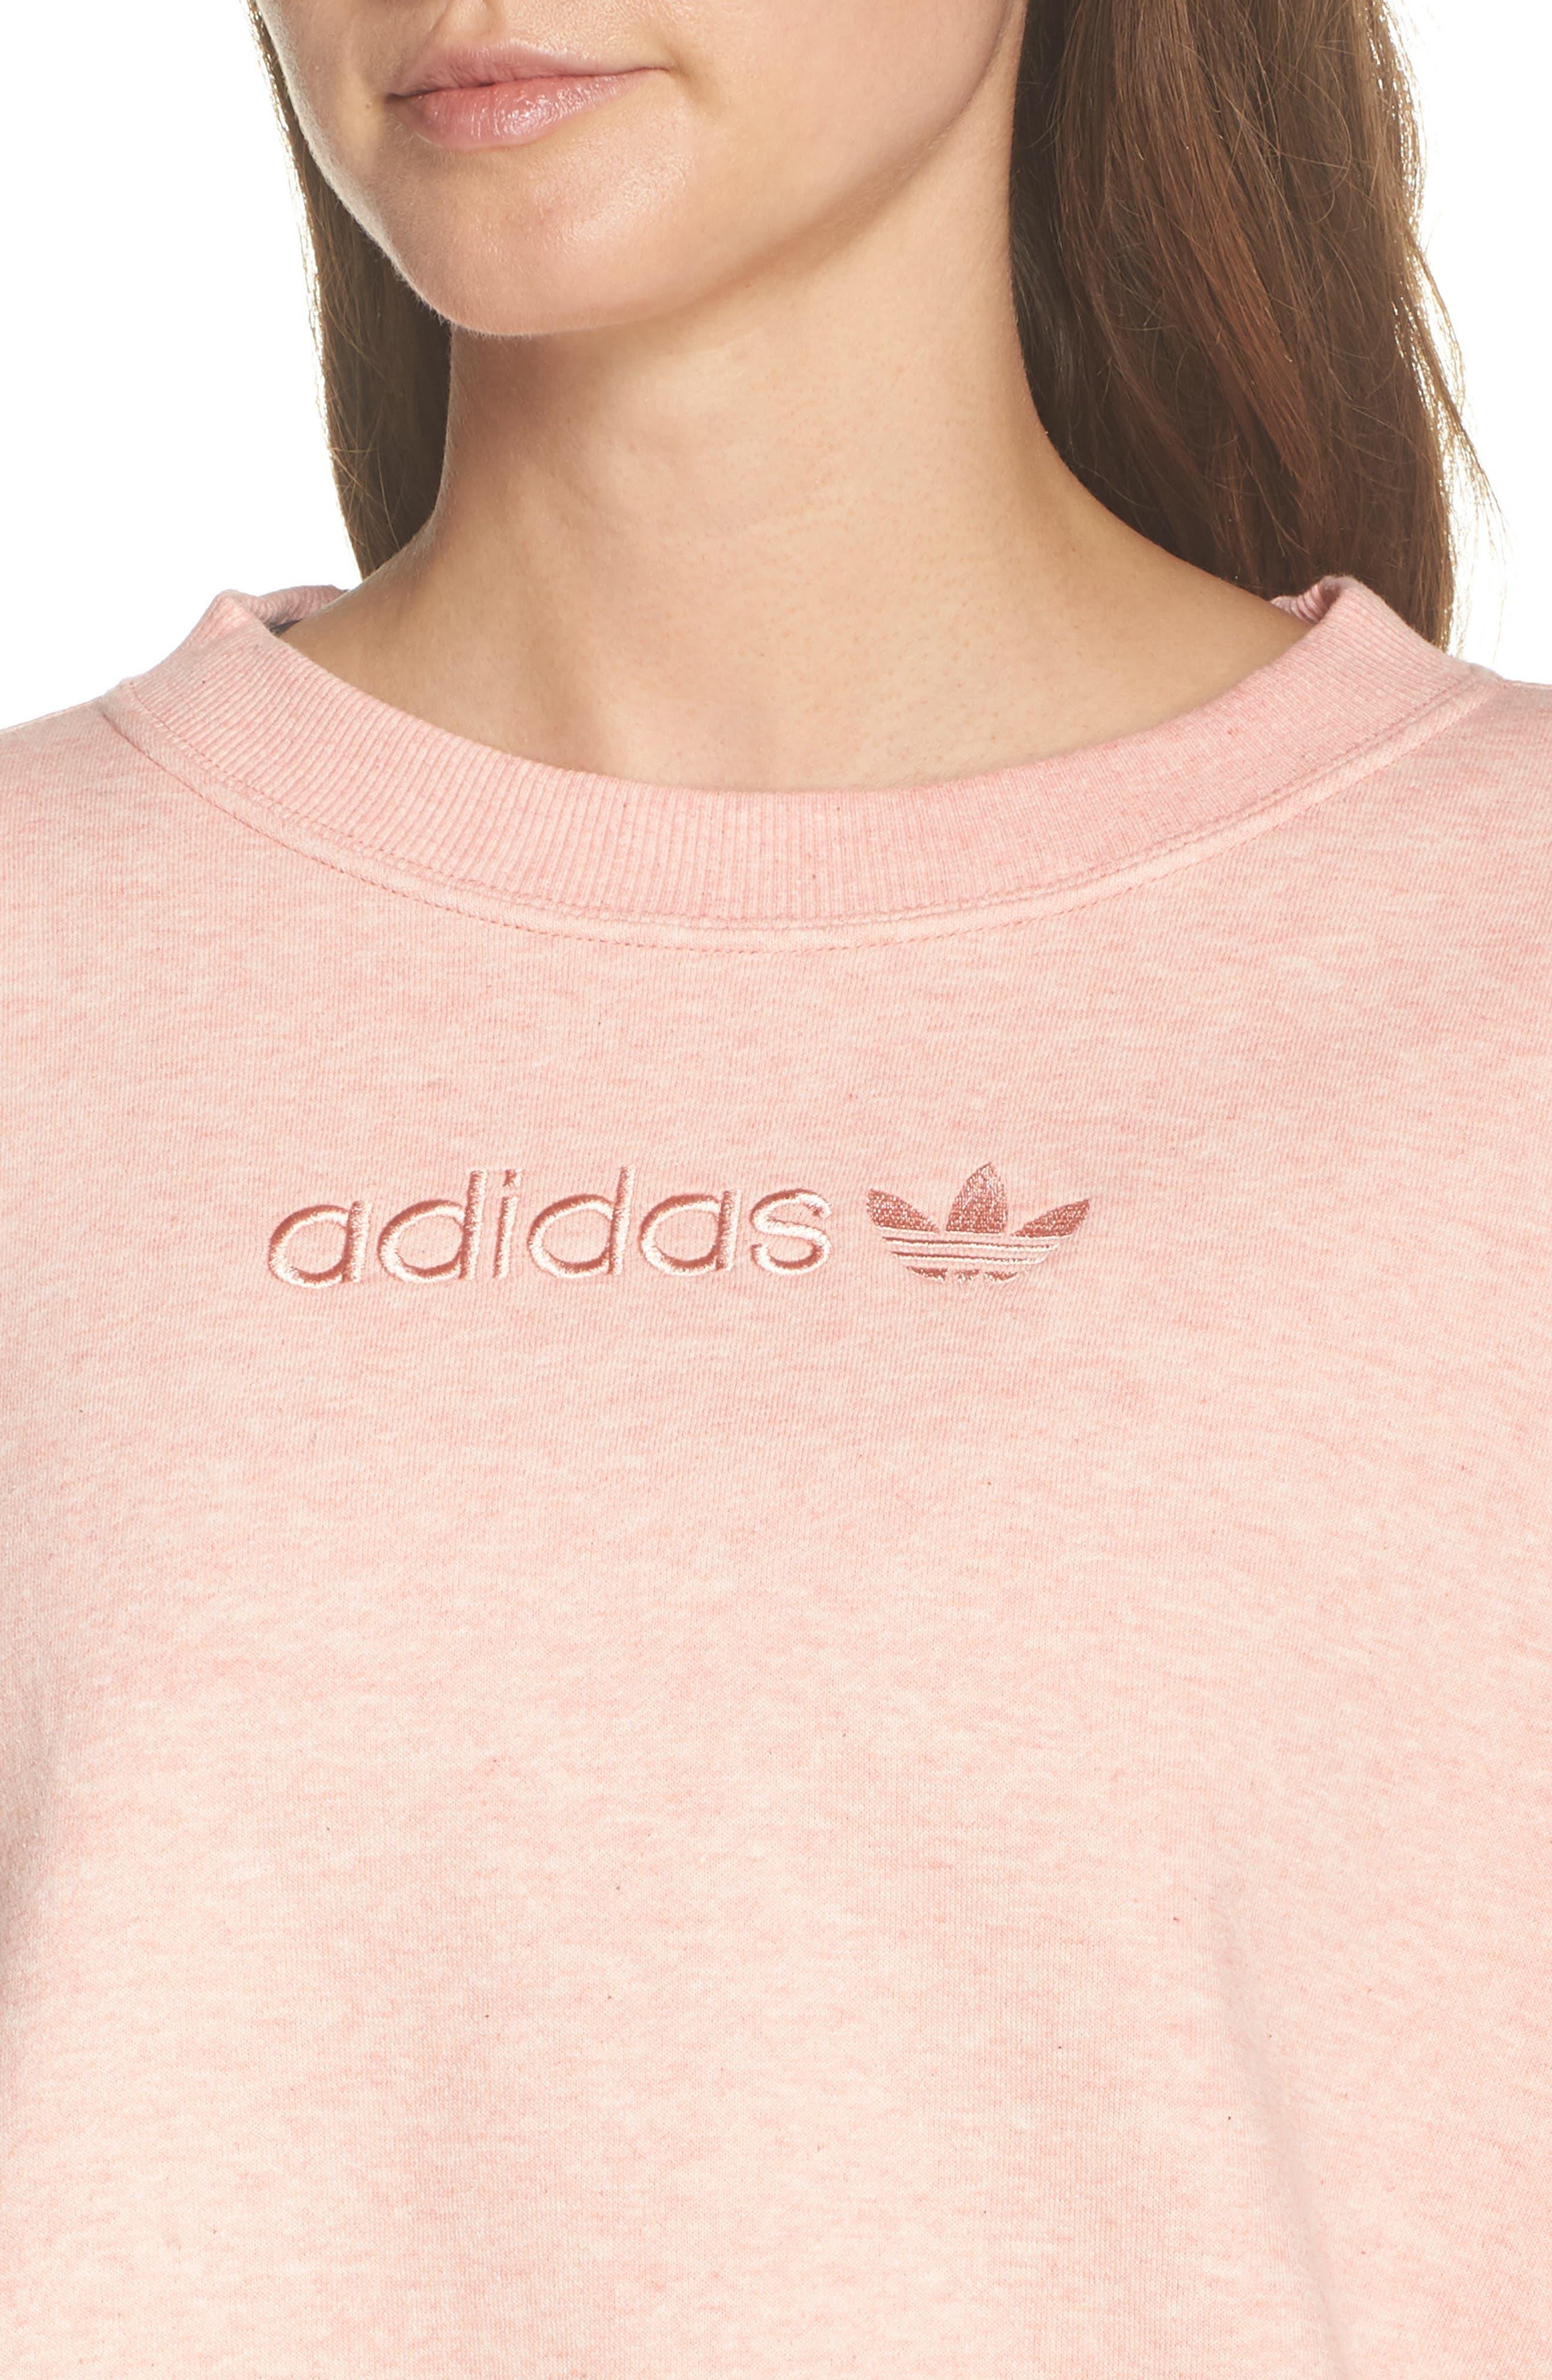 ADIDAS ORIGINALS, adidas Coeeze Crop Sweatshirt, Alternate thumbnail 5, color, 650